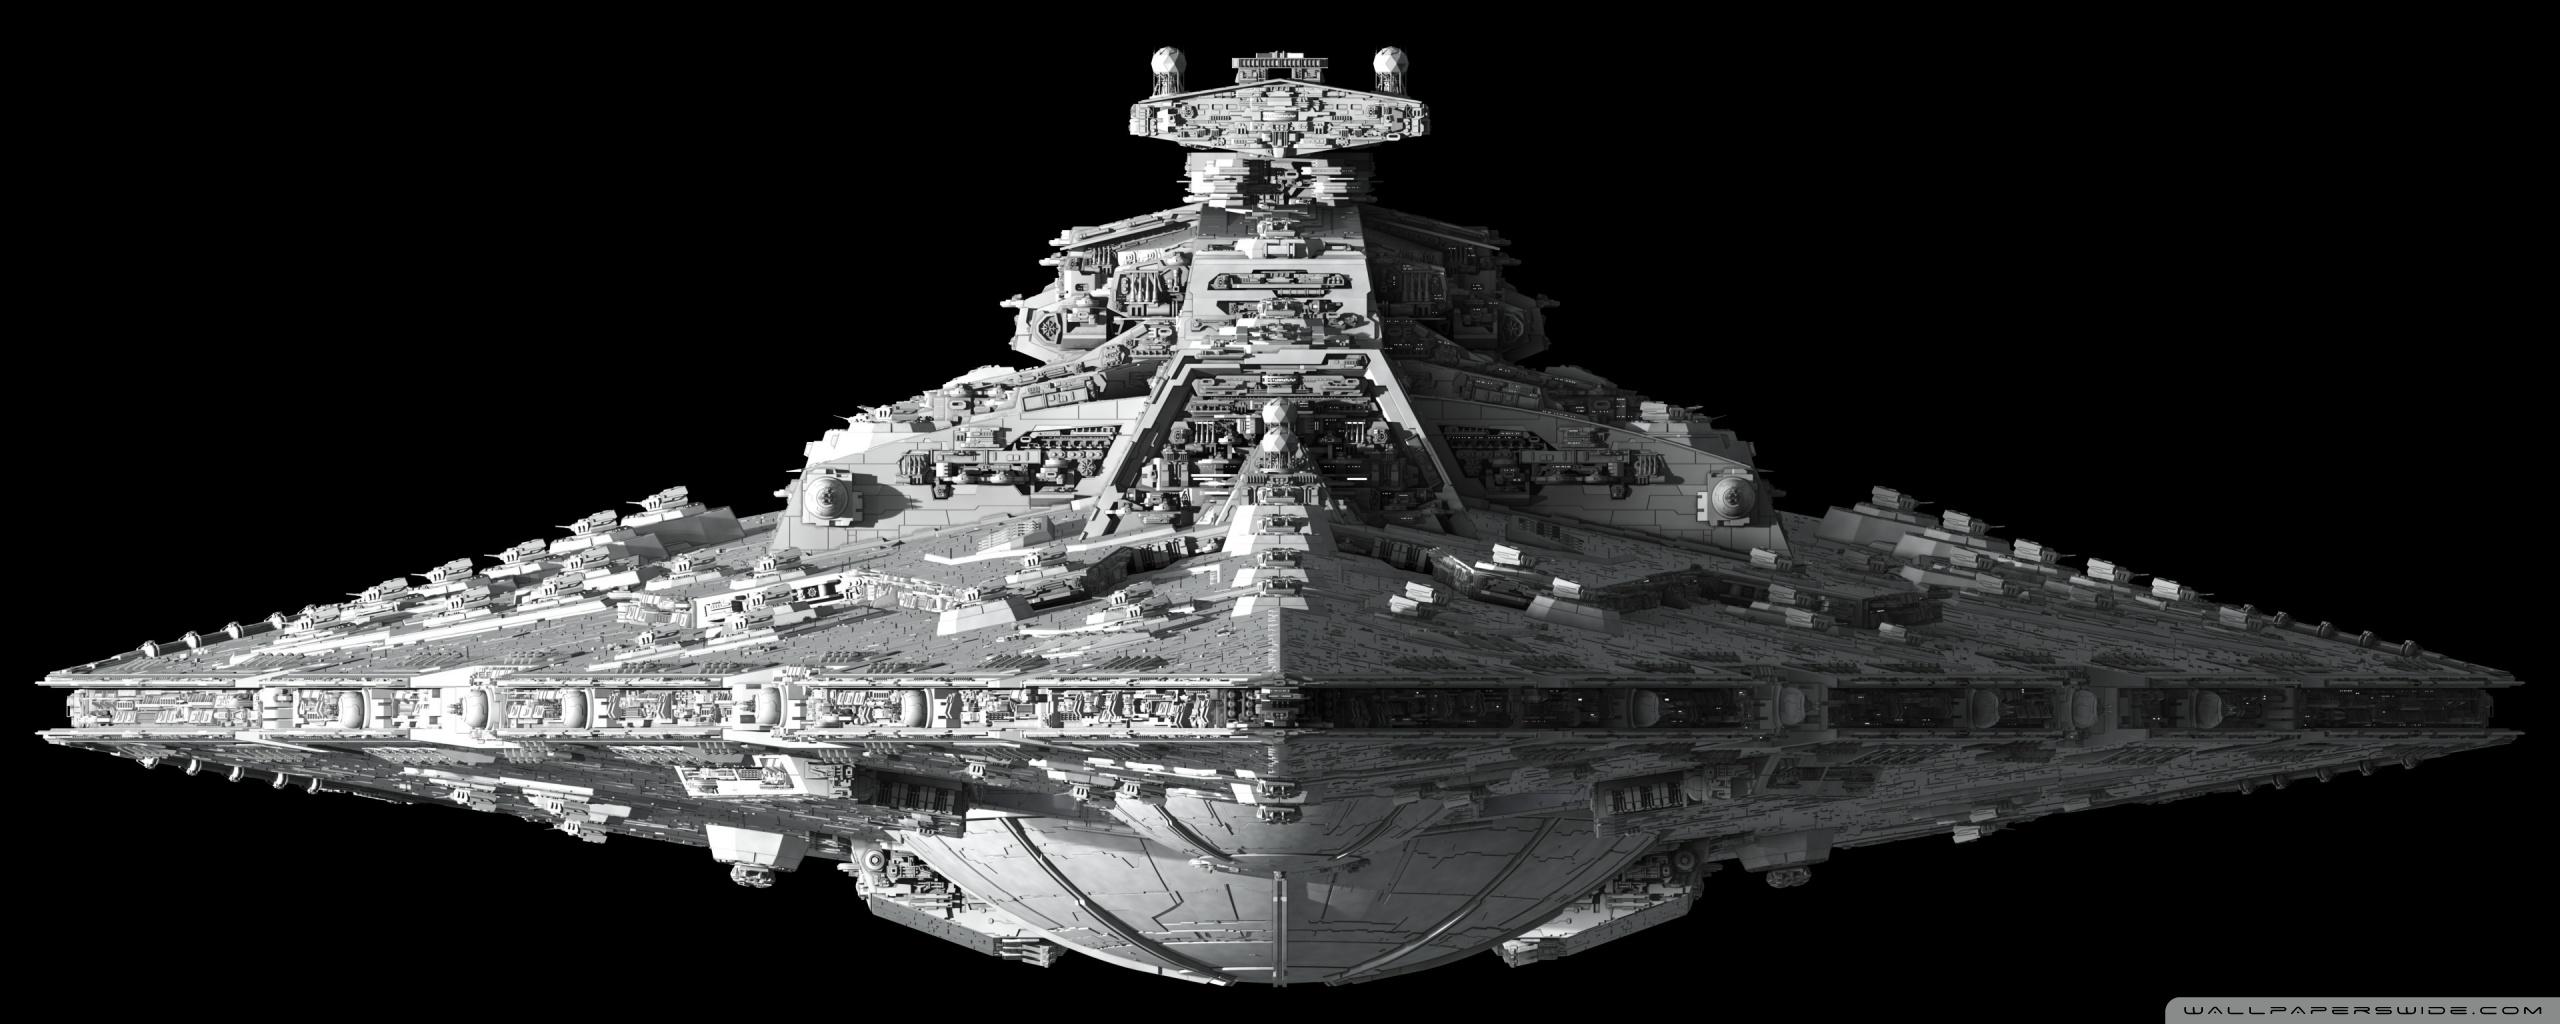 Star Wars Destroyer HD desktop wallpaper : High Definition